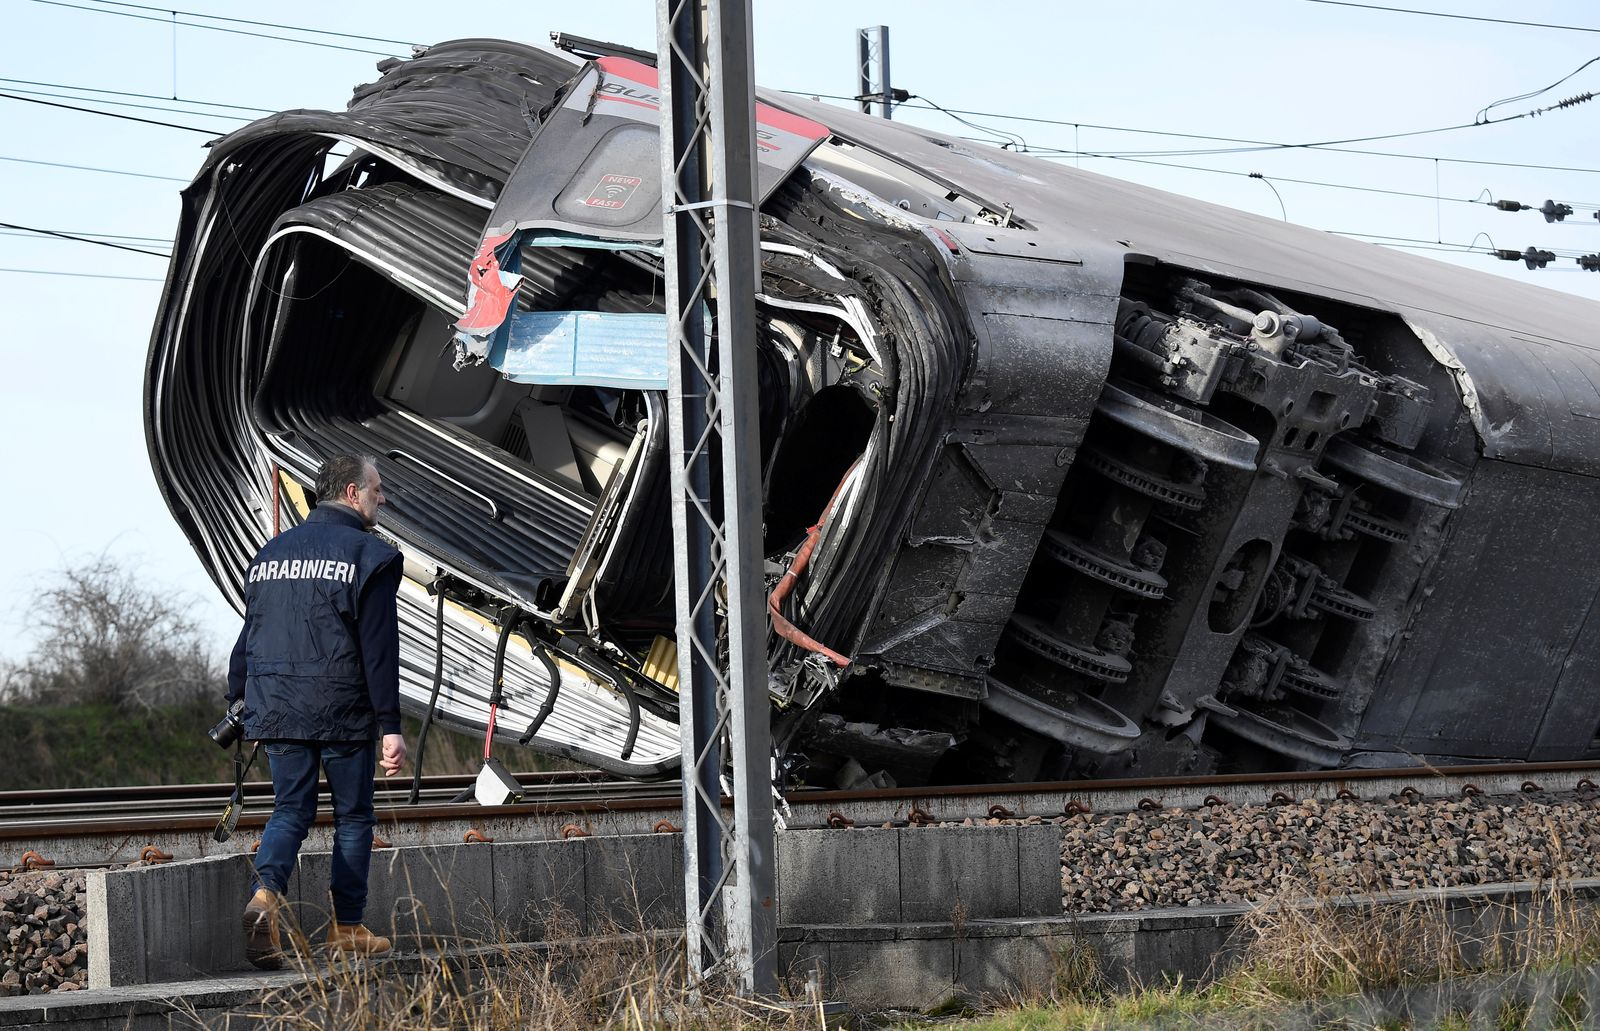 High speed train derails near Lodi